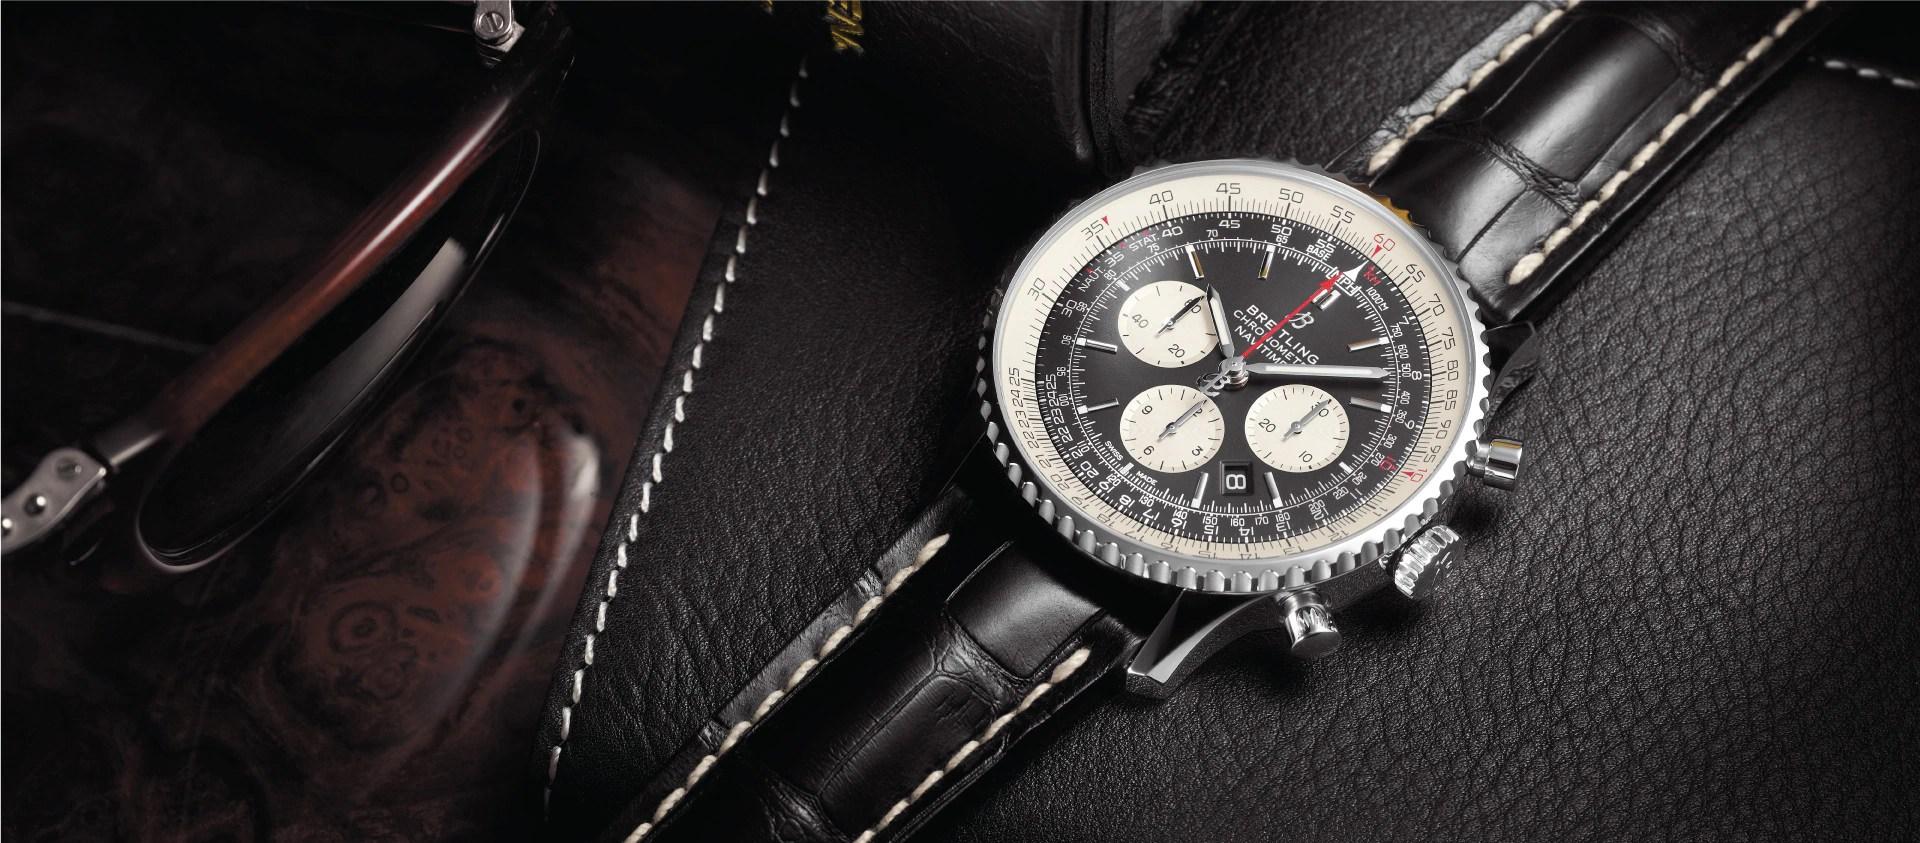 Breitling | 腕錶 | 濱海灣金沙購物商城